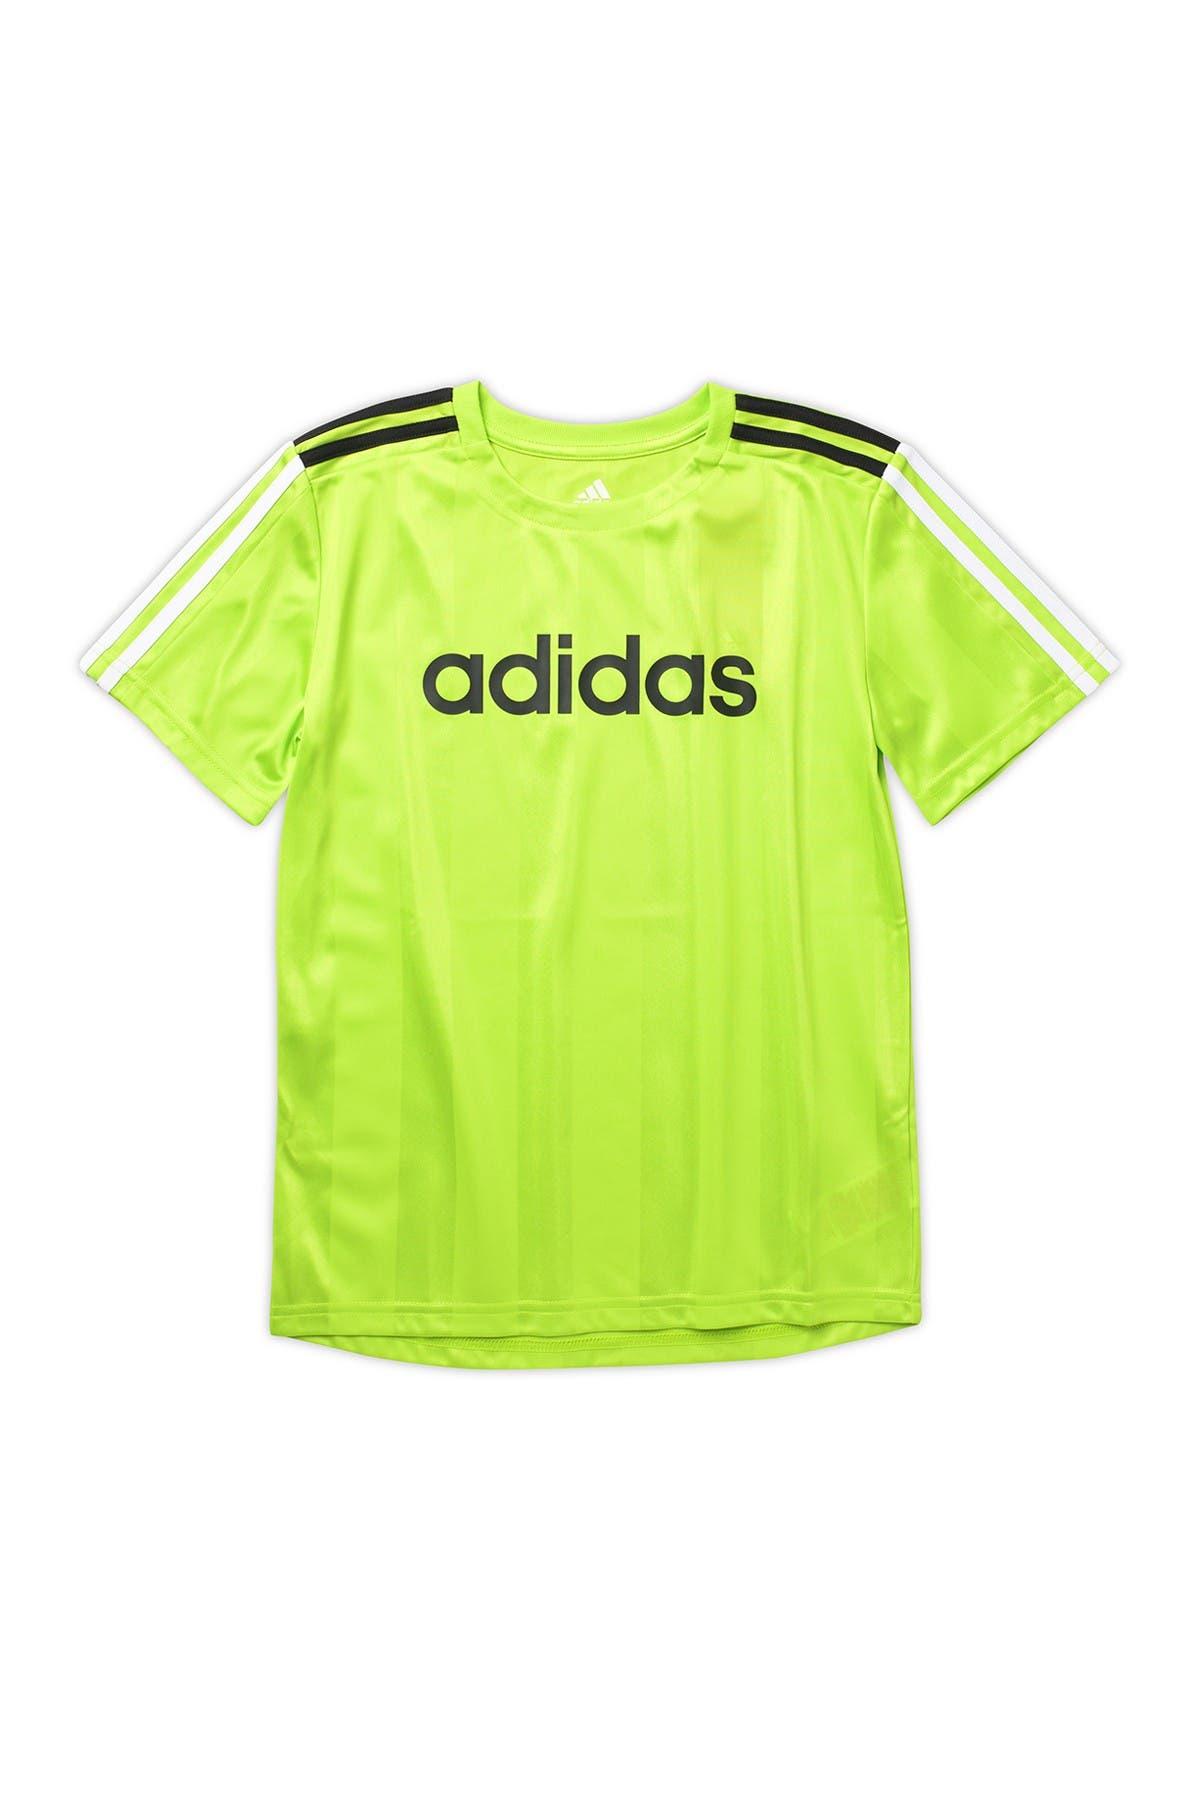 Image of ADIDAS ORIGINALS Short Sleeve Logo T-Shirt